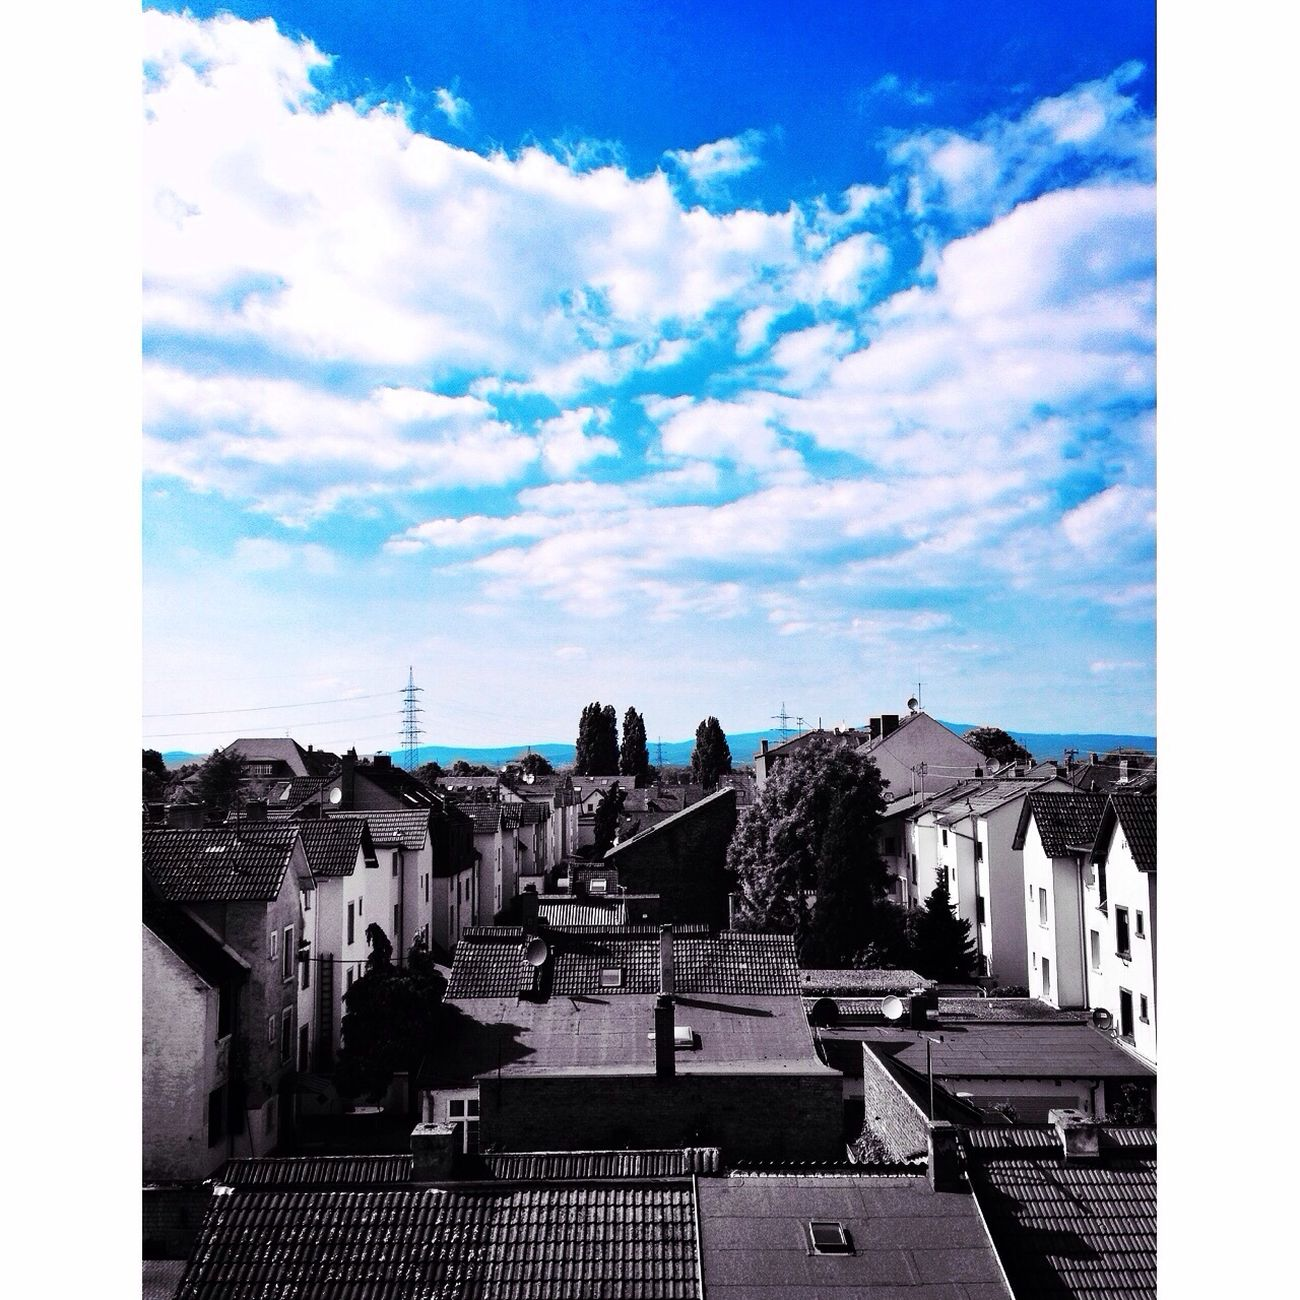 EyeEm Best Edits EyeEm Best Shots Clouds And Sky Landscape_Collection